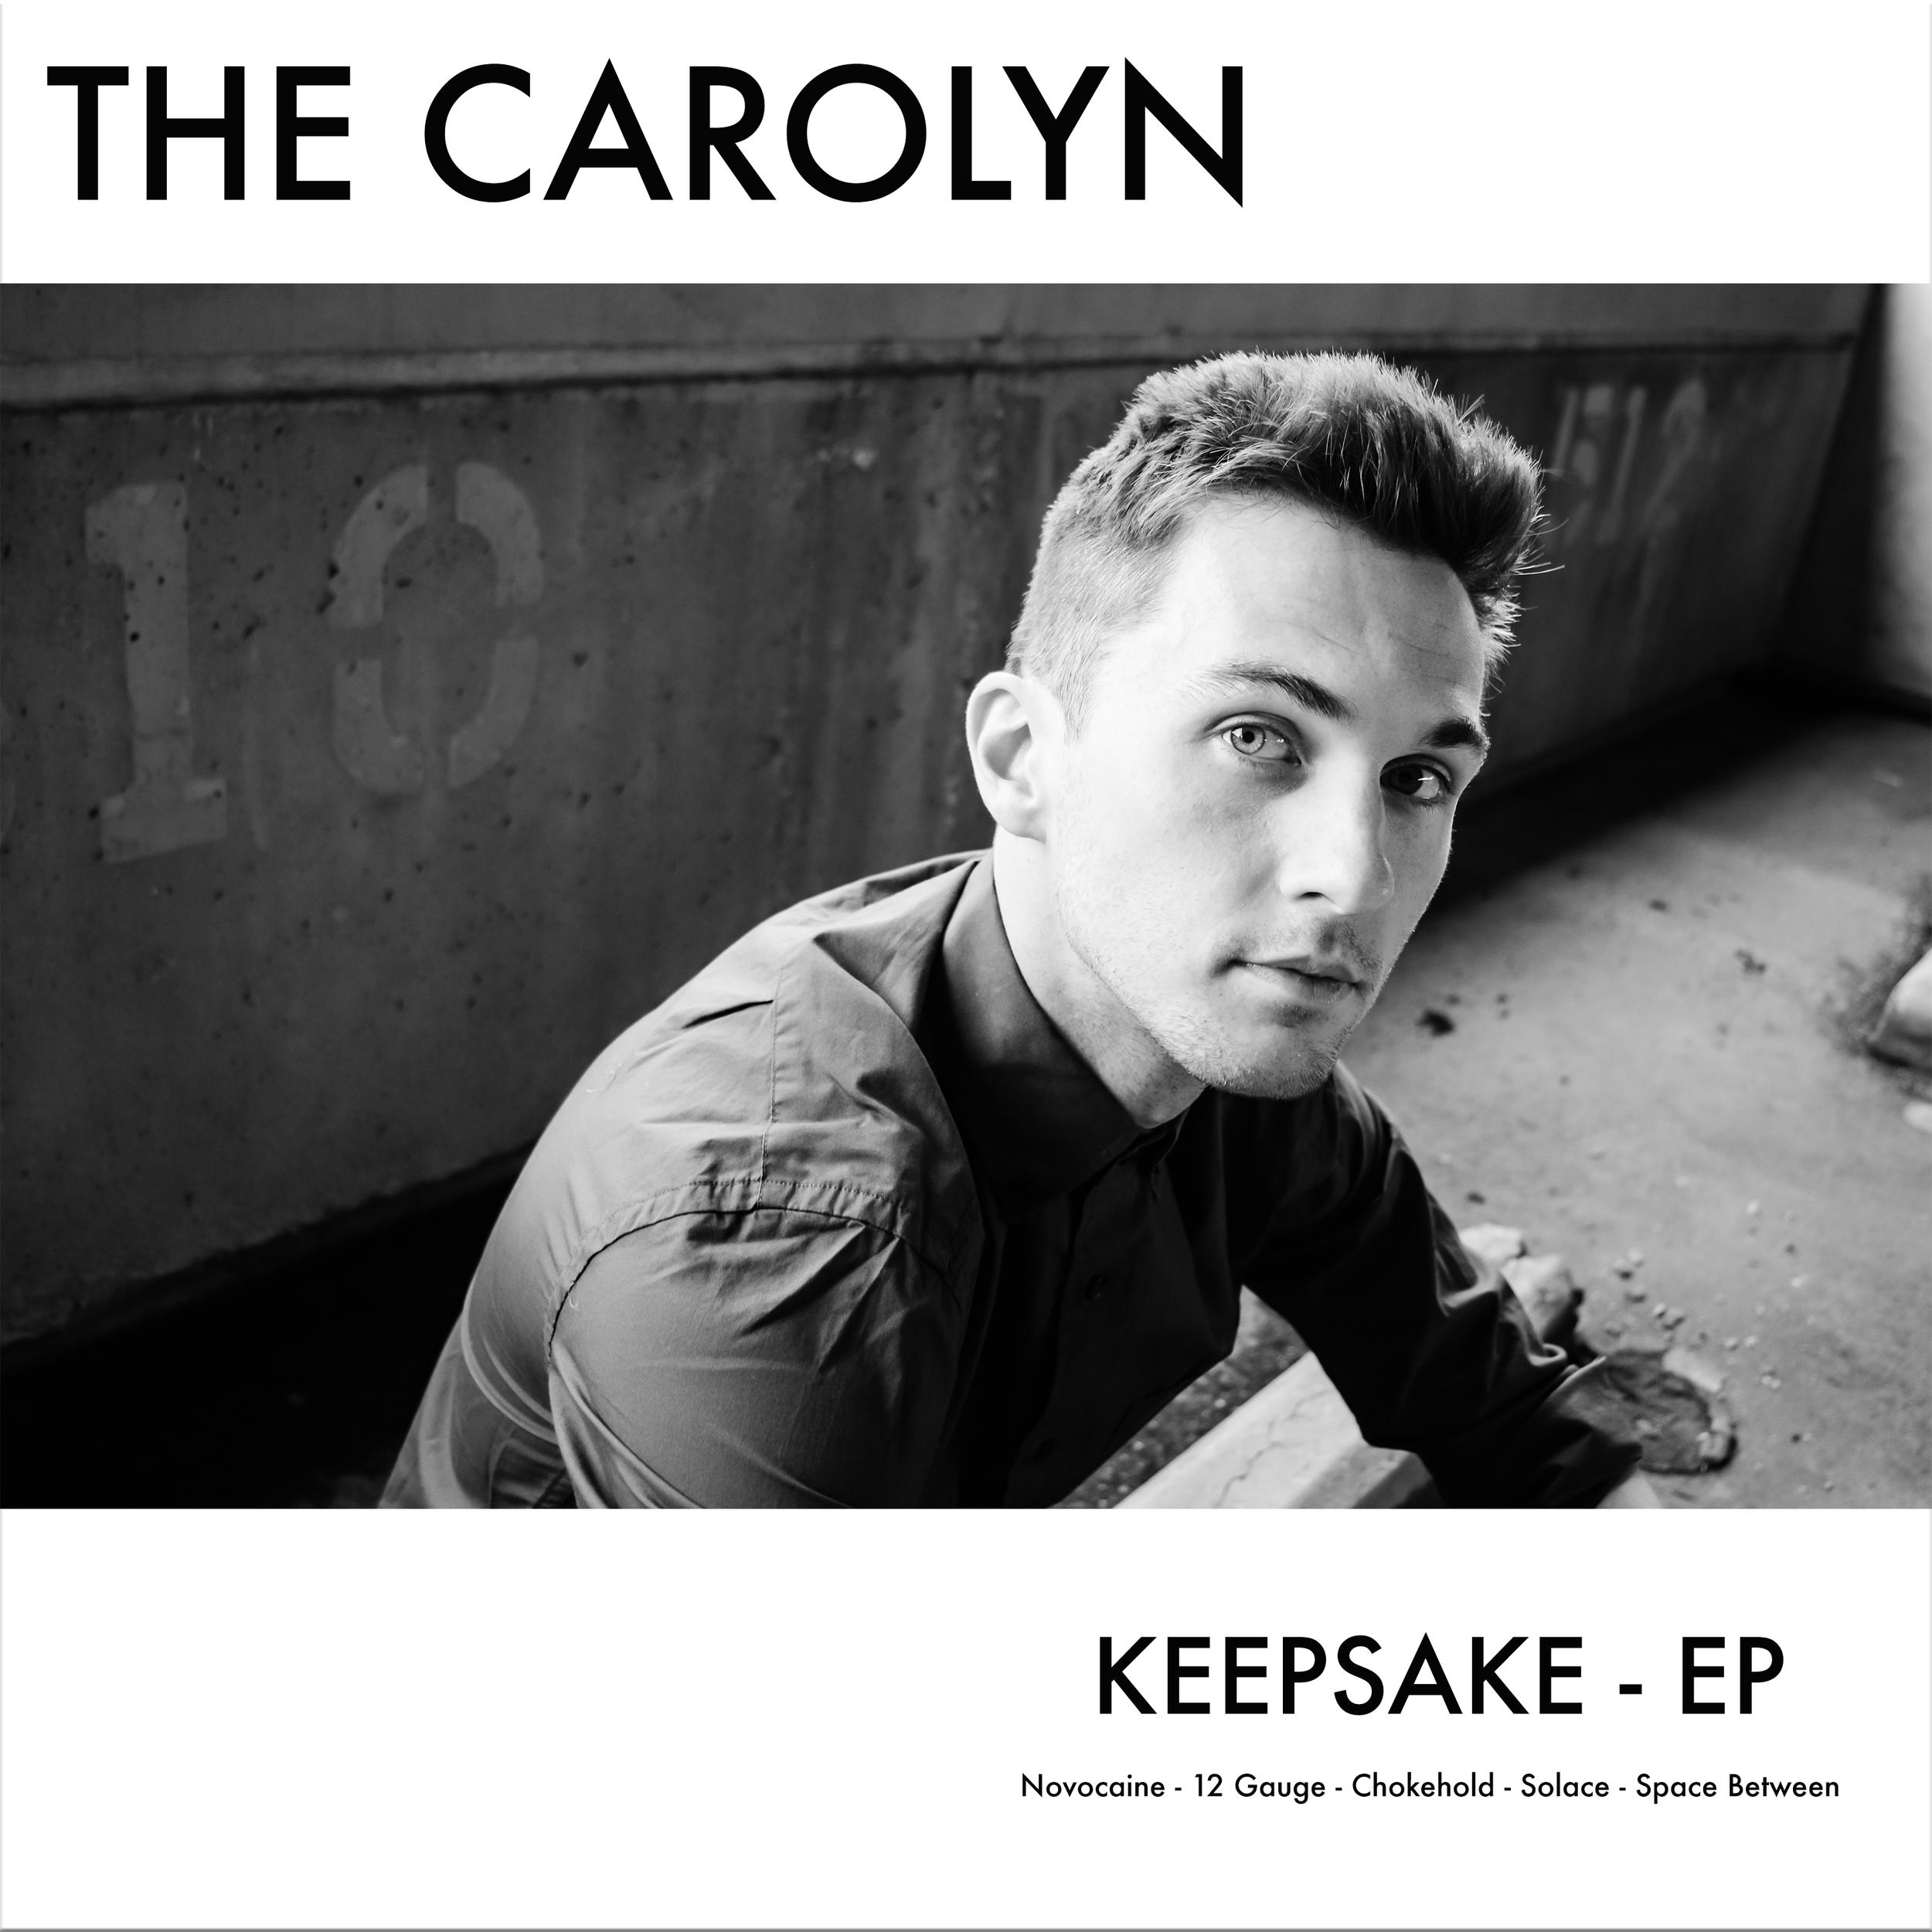 THE CAROLYN - KEEPSAKE EP (2016)